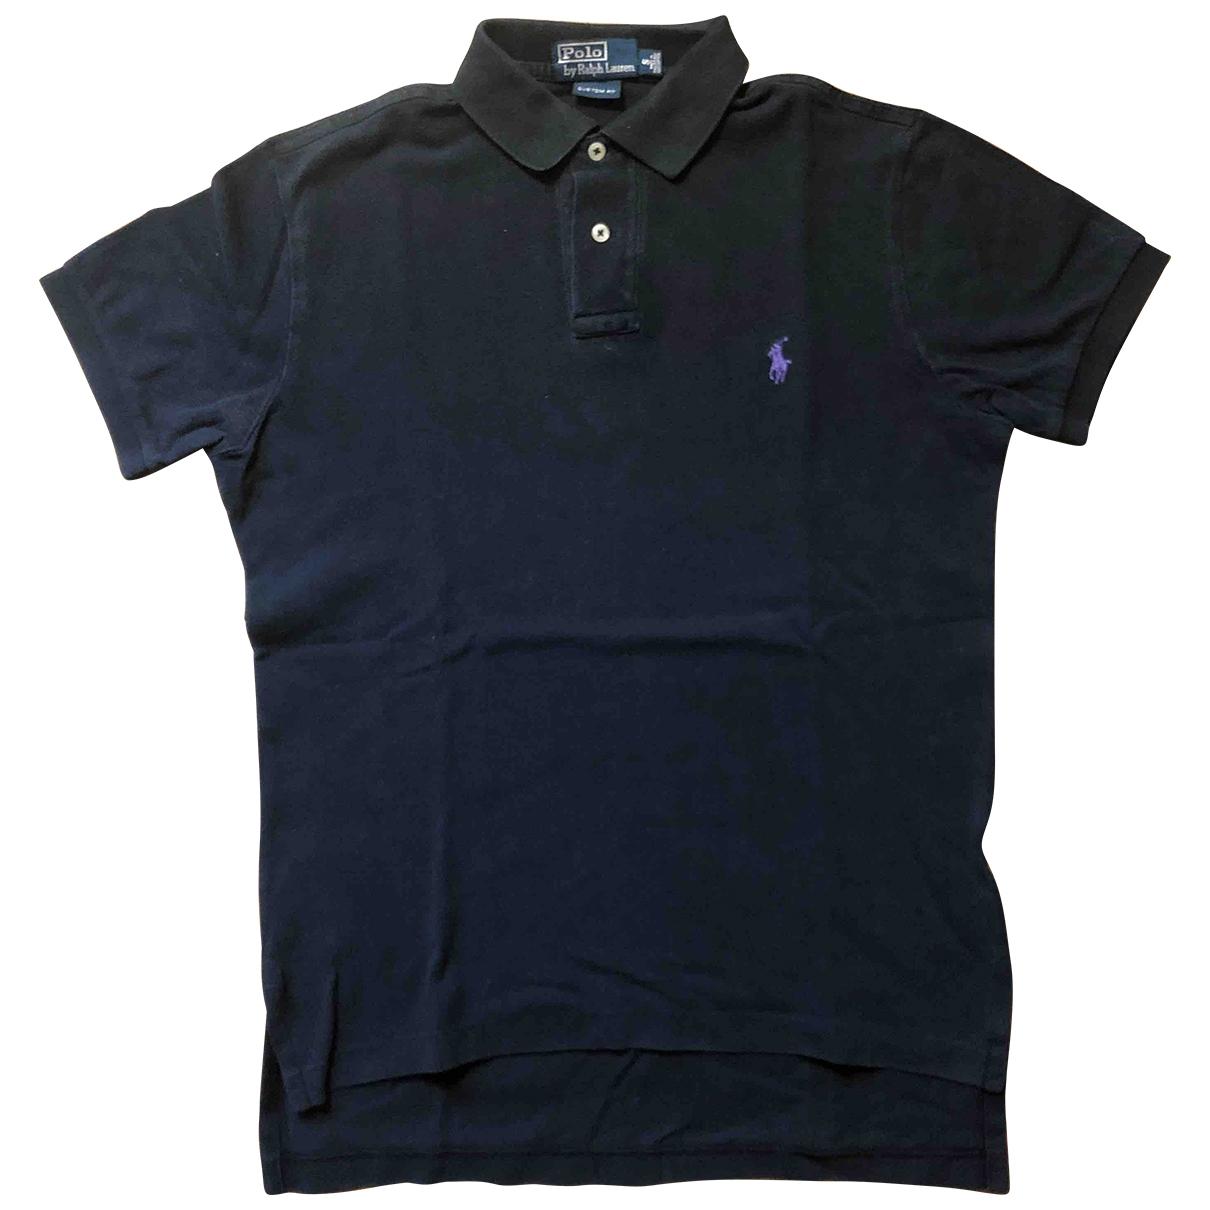 Polo Ralph Lauren Polo ajuste manches courtes Poloshirts in  Schwarz Baumwolle